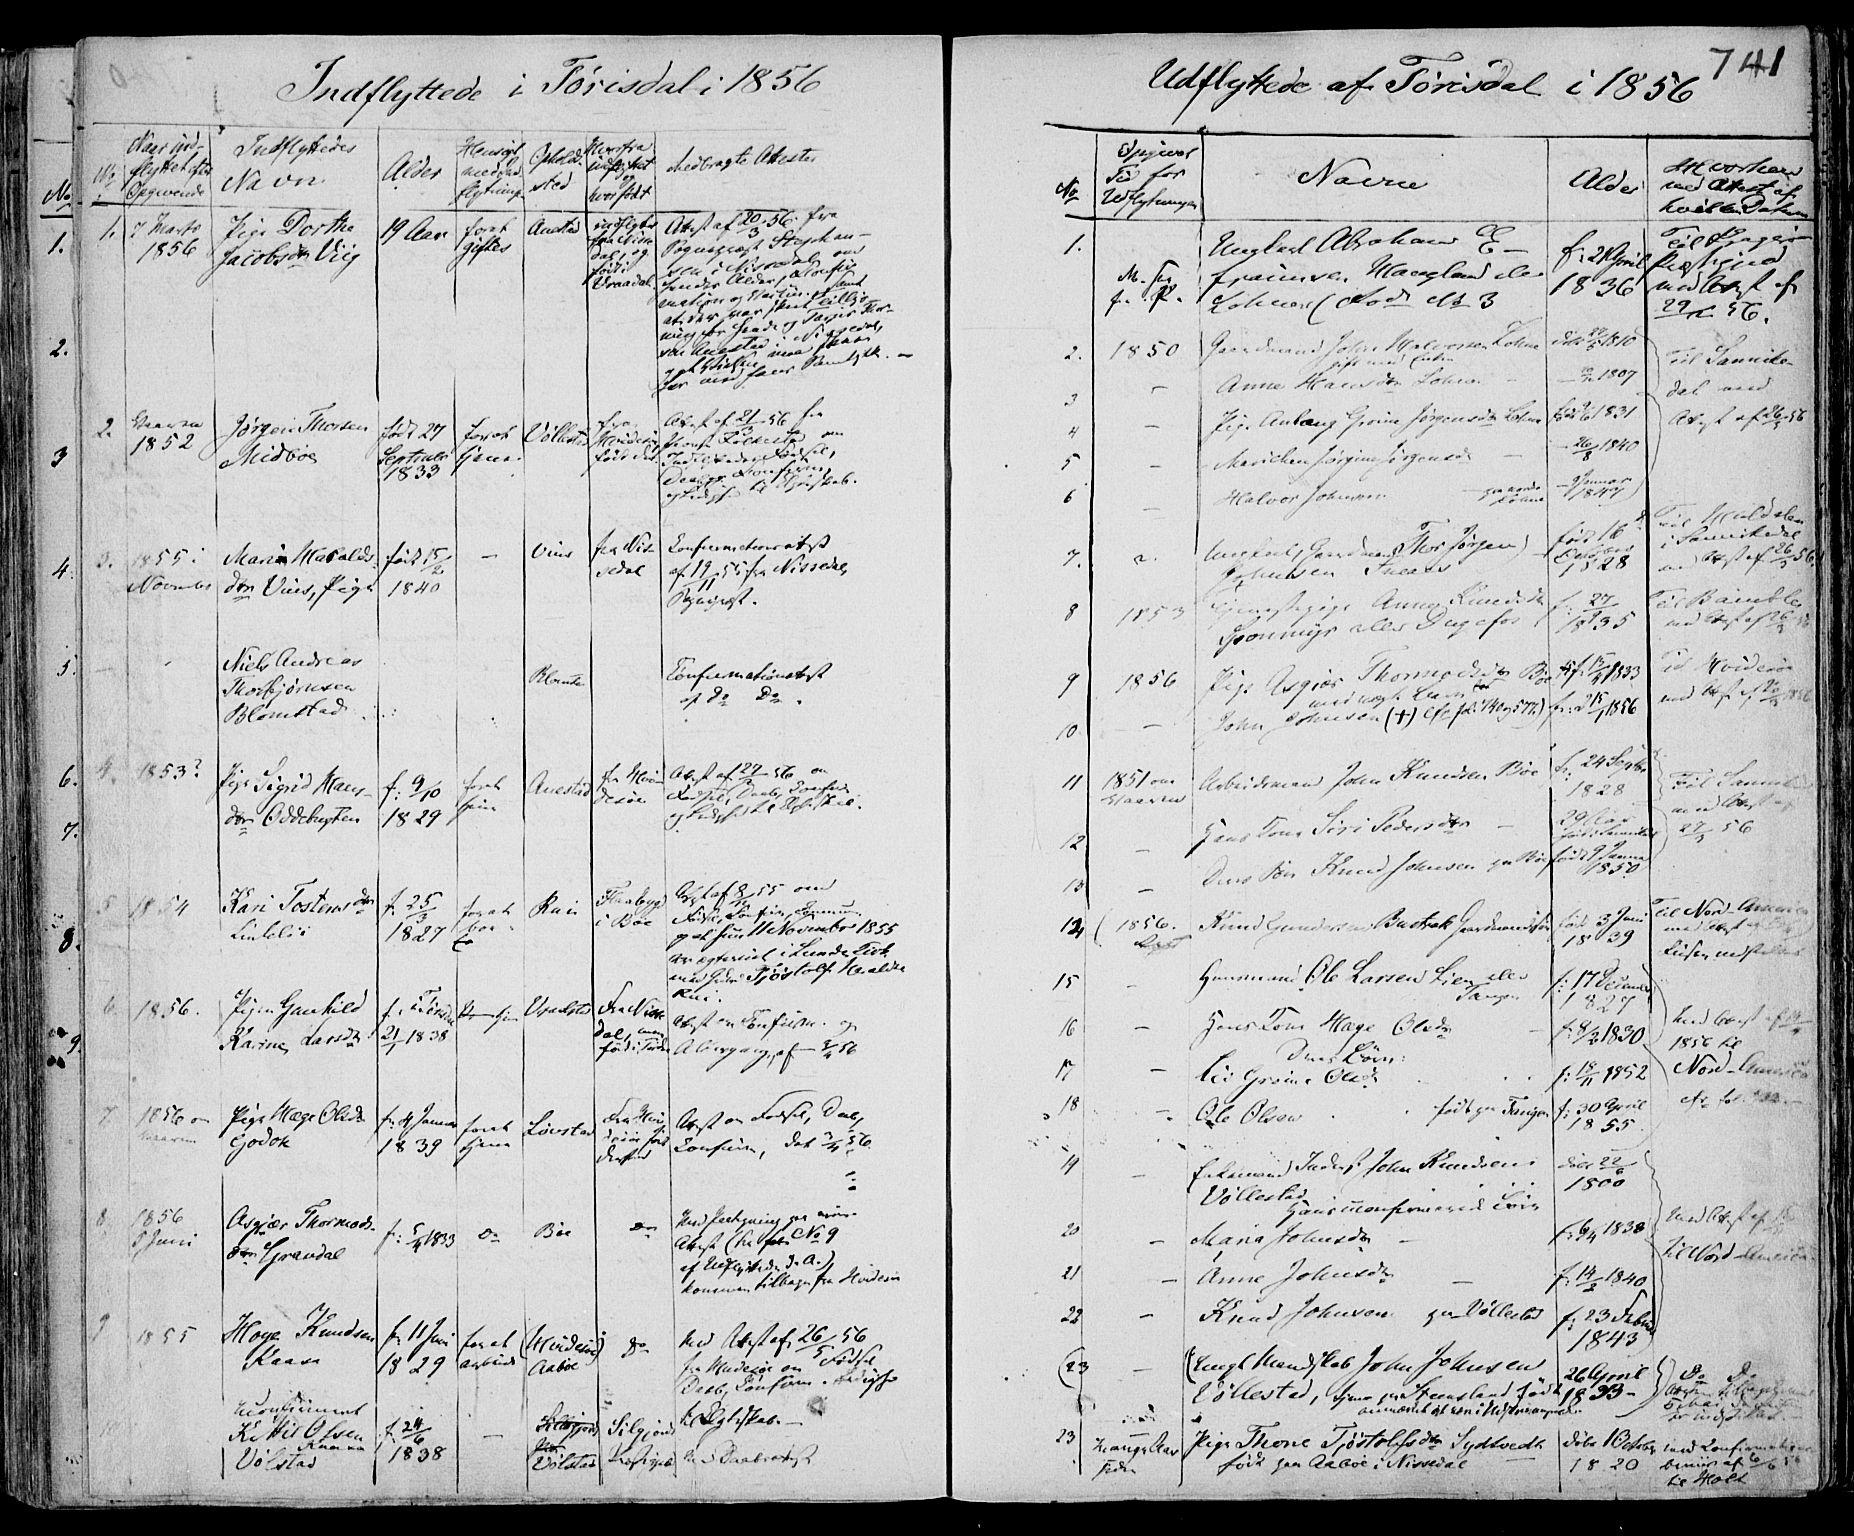 SAKO, Drangedal kirkebøker, F/Fa/L0007b: Ministerialbok nr. 7b, 1837-1856, s. 741